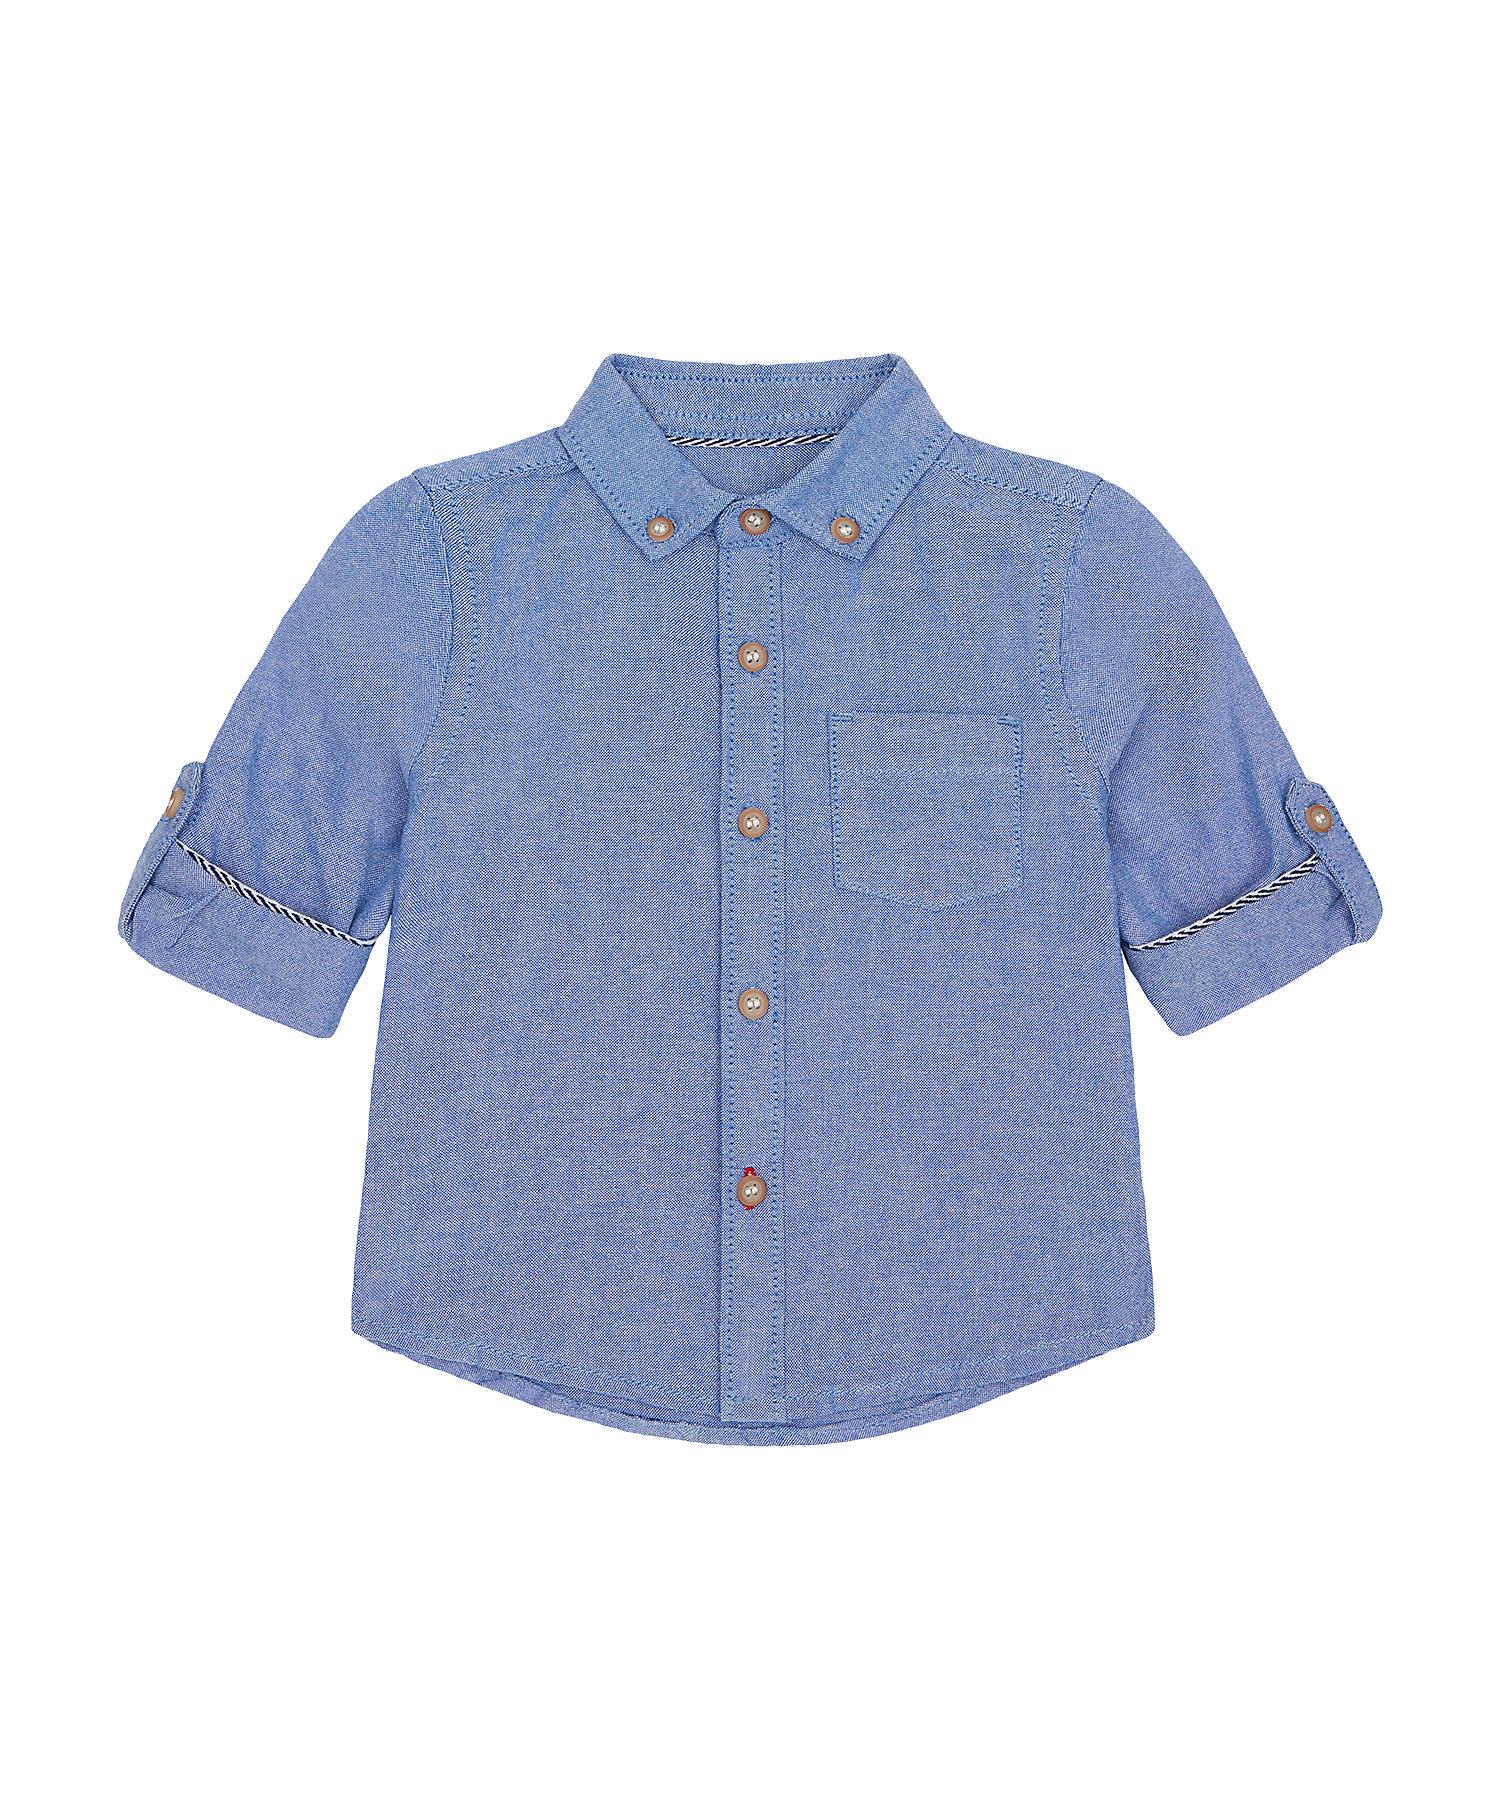 Mothercare | Boys Full Sleeves Oxford Shirt - Blue